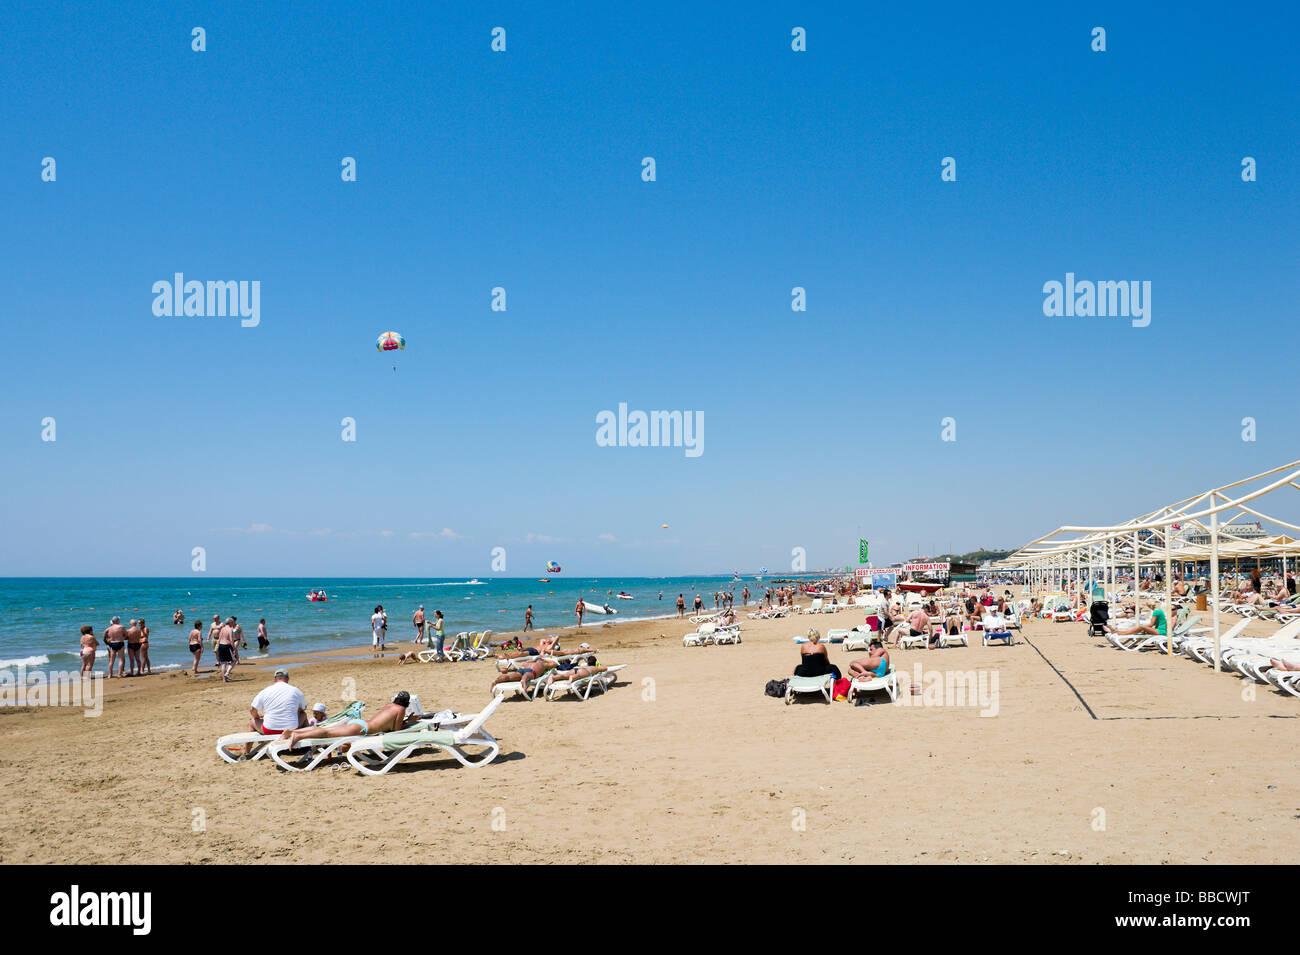 Beach to the west of Side, Mediterranean Coast, Turkey - Stock Image